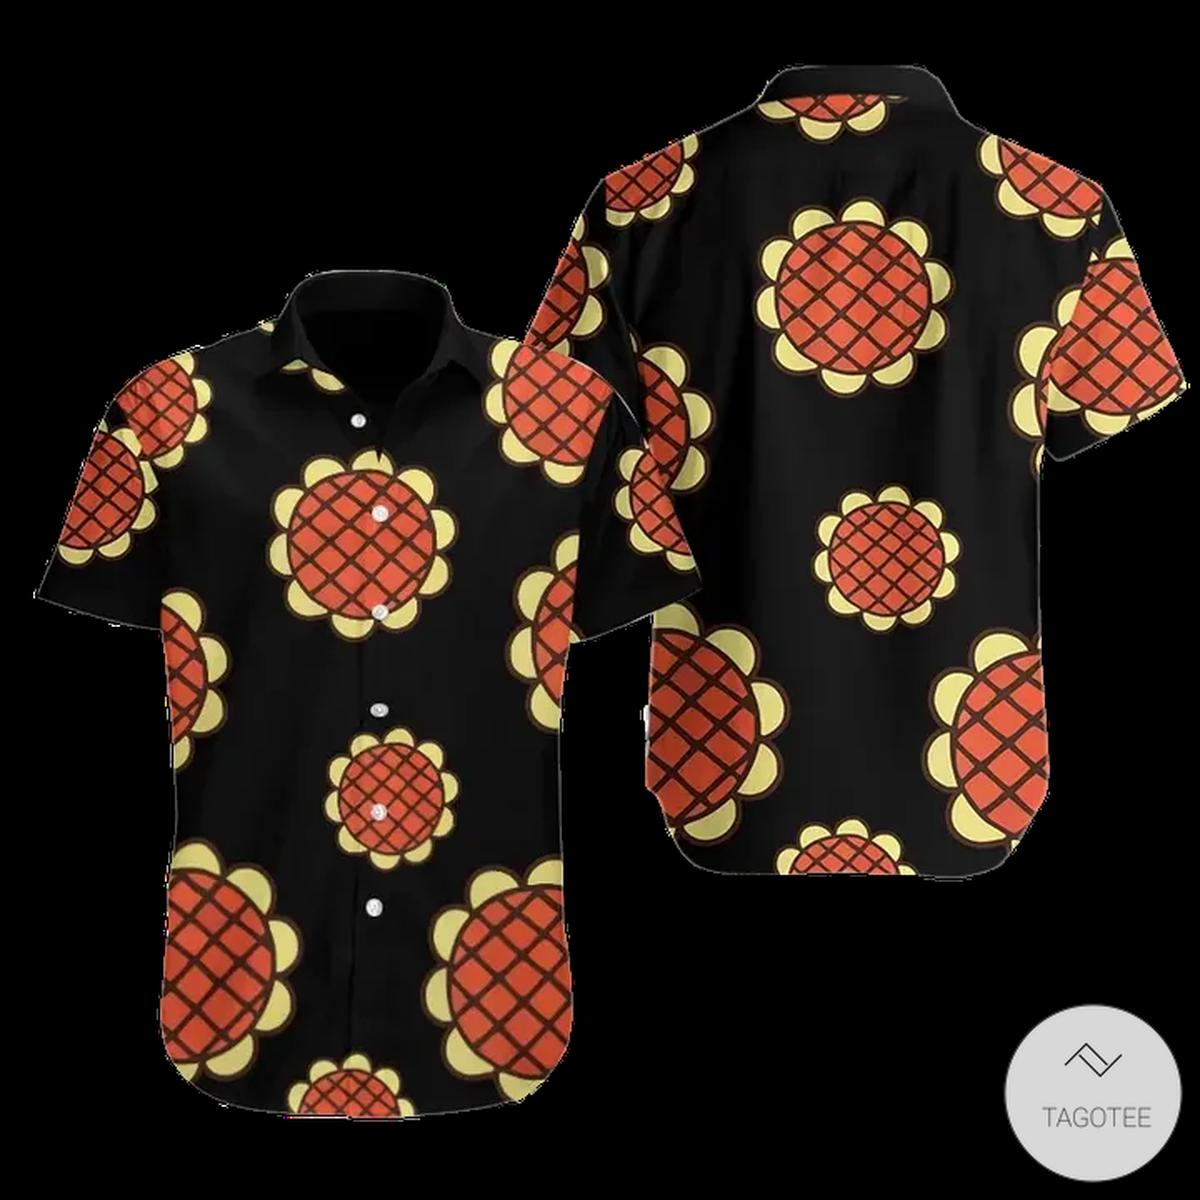 Monkey D. Luffy Hawaiian Shirt, Beach Shorts